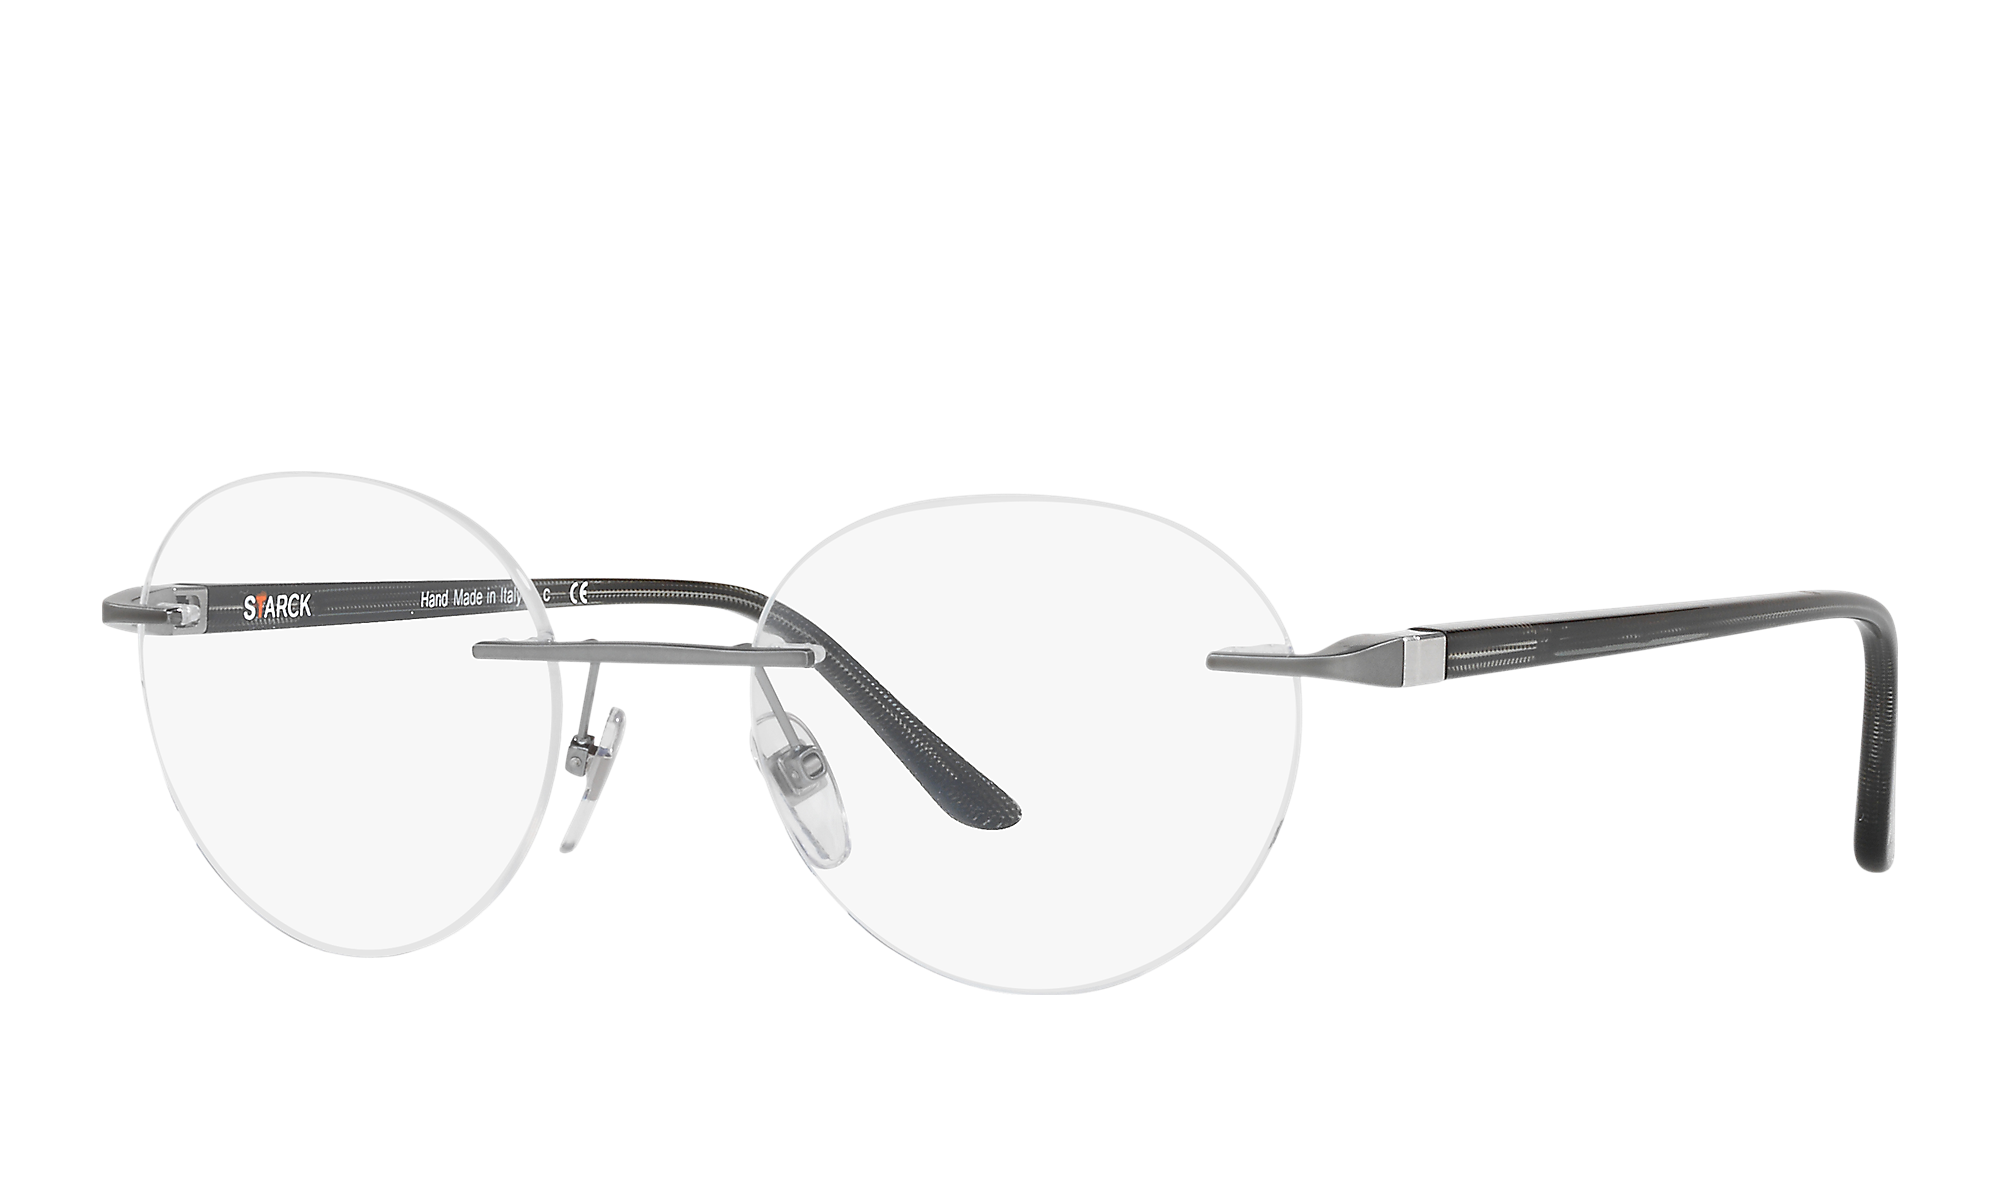 Starck SH2021 | Glasses.com® | Free Shipping